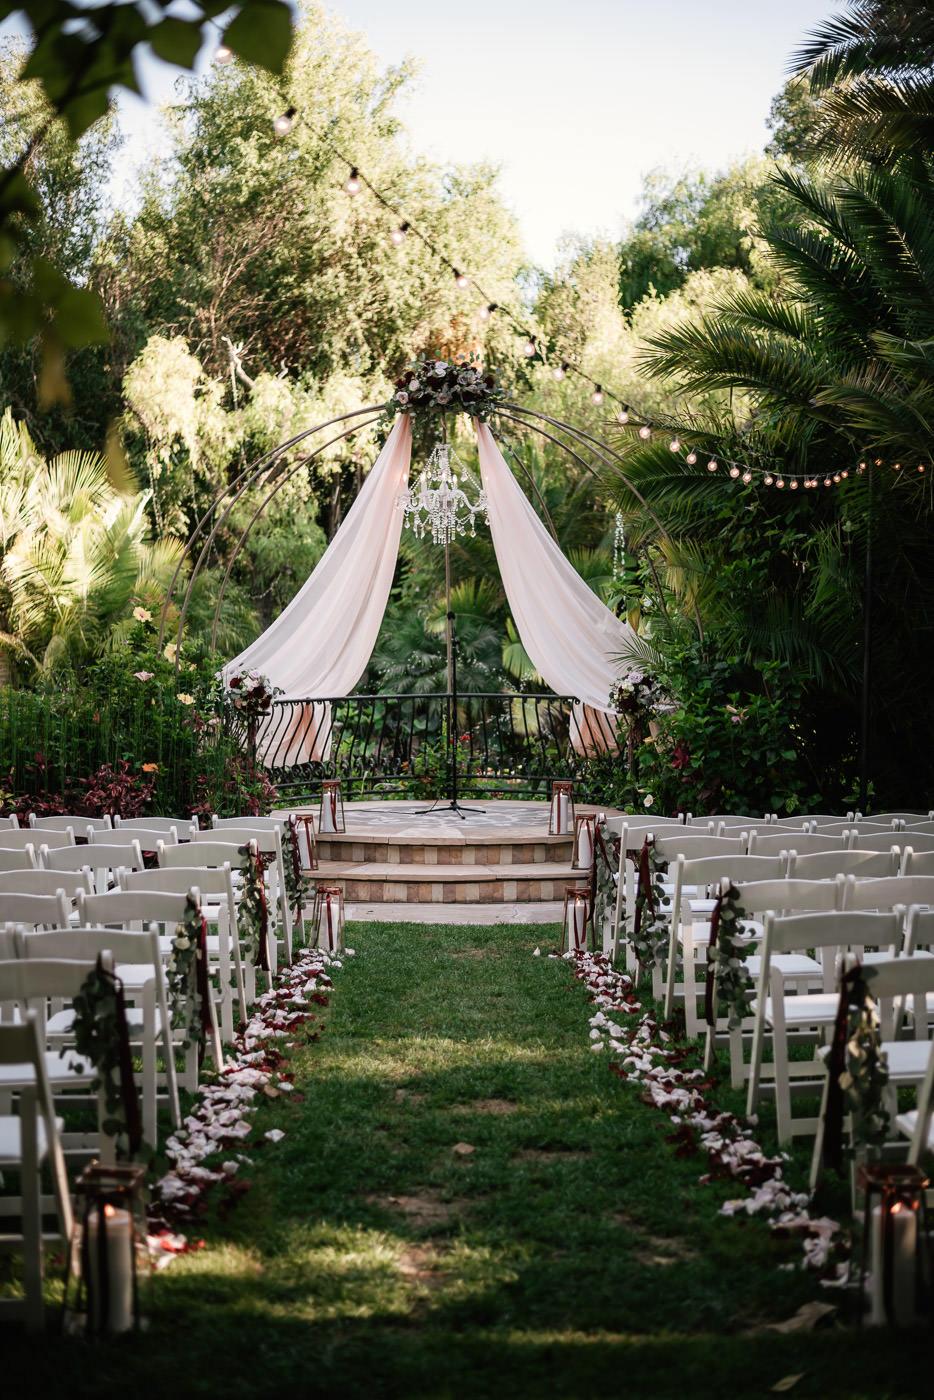 eden-gardens-wedding-photographer-romantic-30.jpg